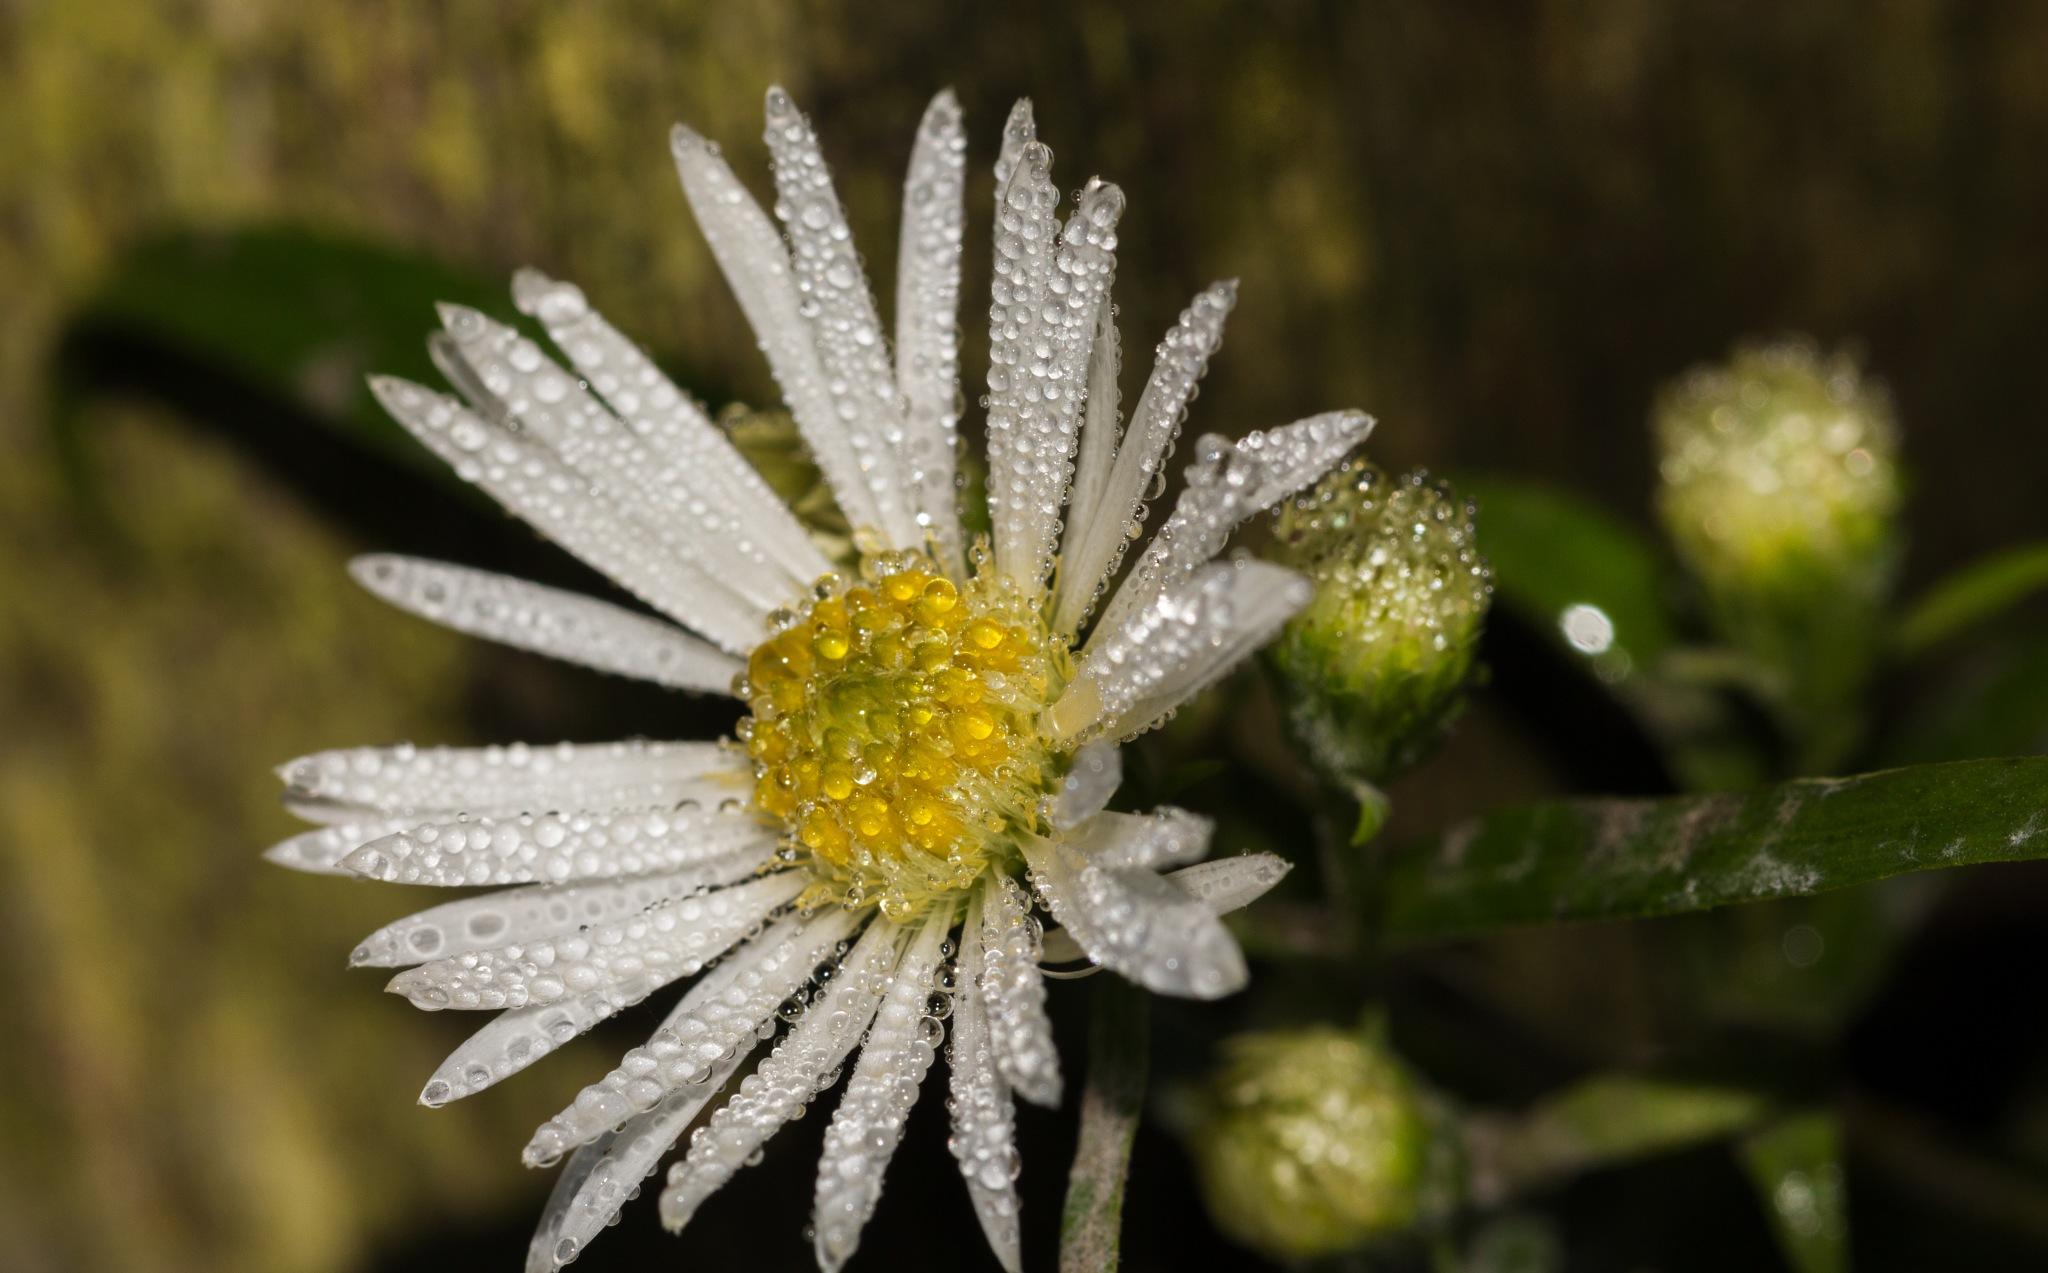 daisy in morning dew by Elena Krauze